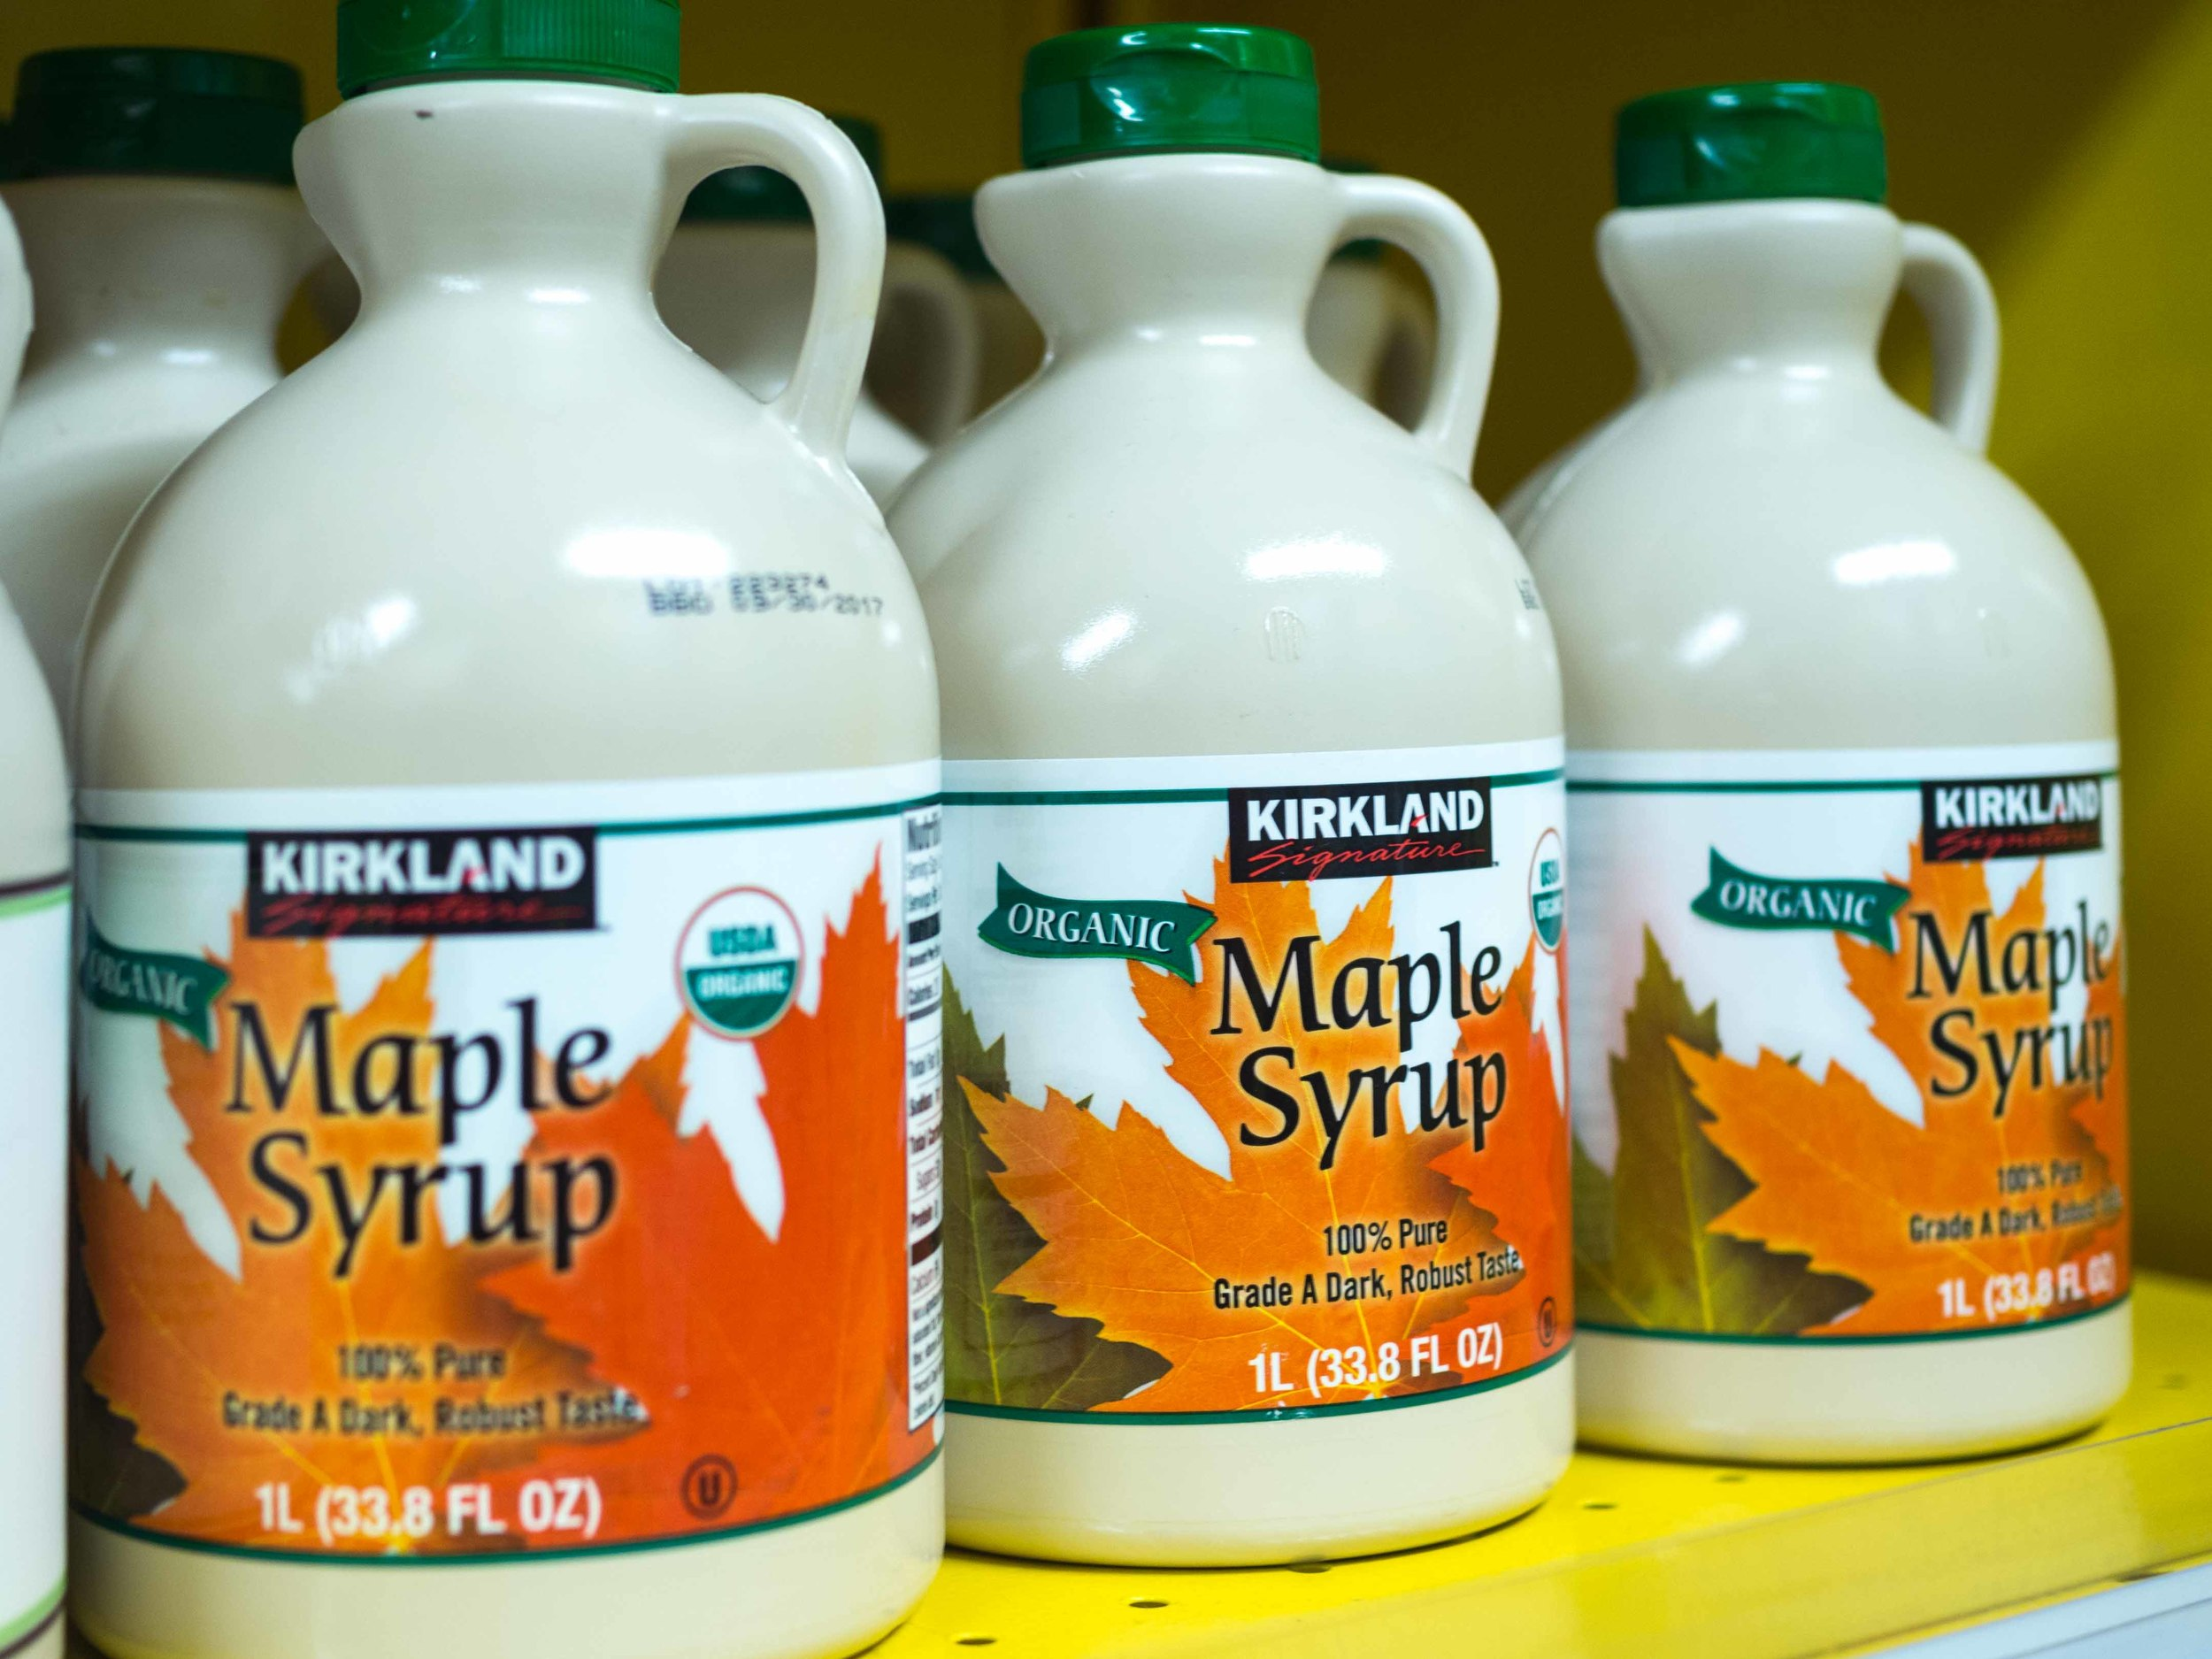 Kirkland Organic Maple Syrup